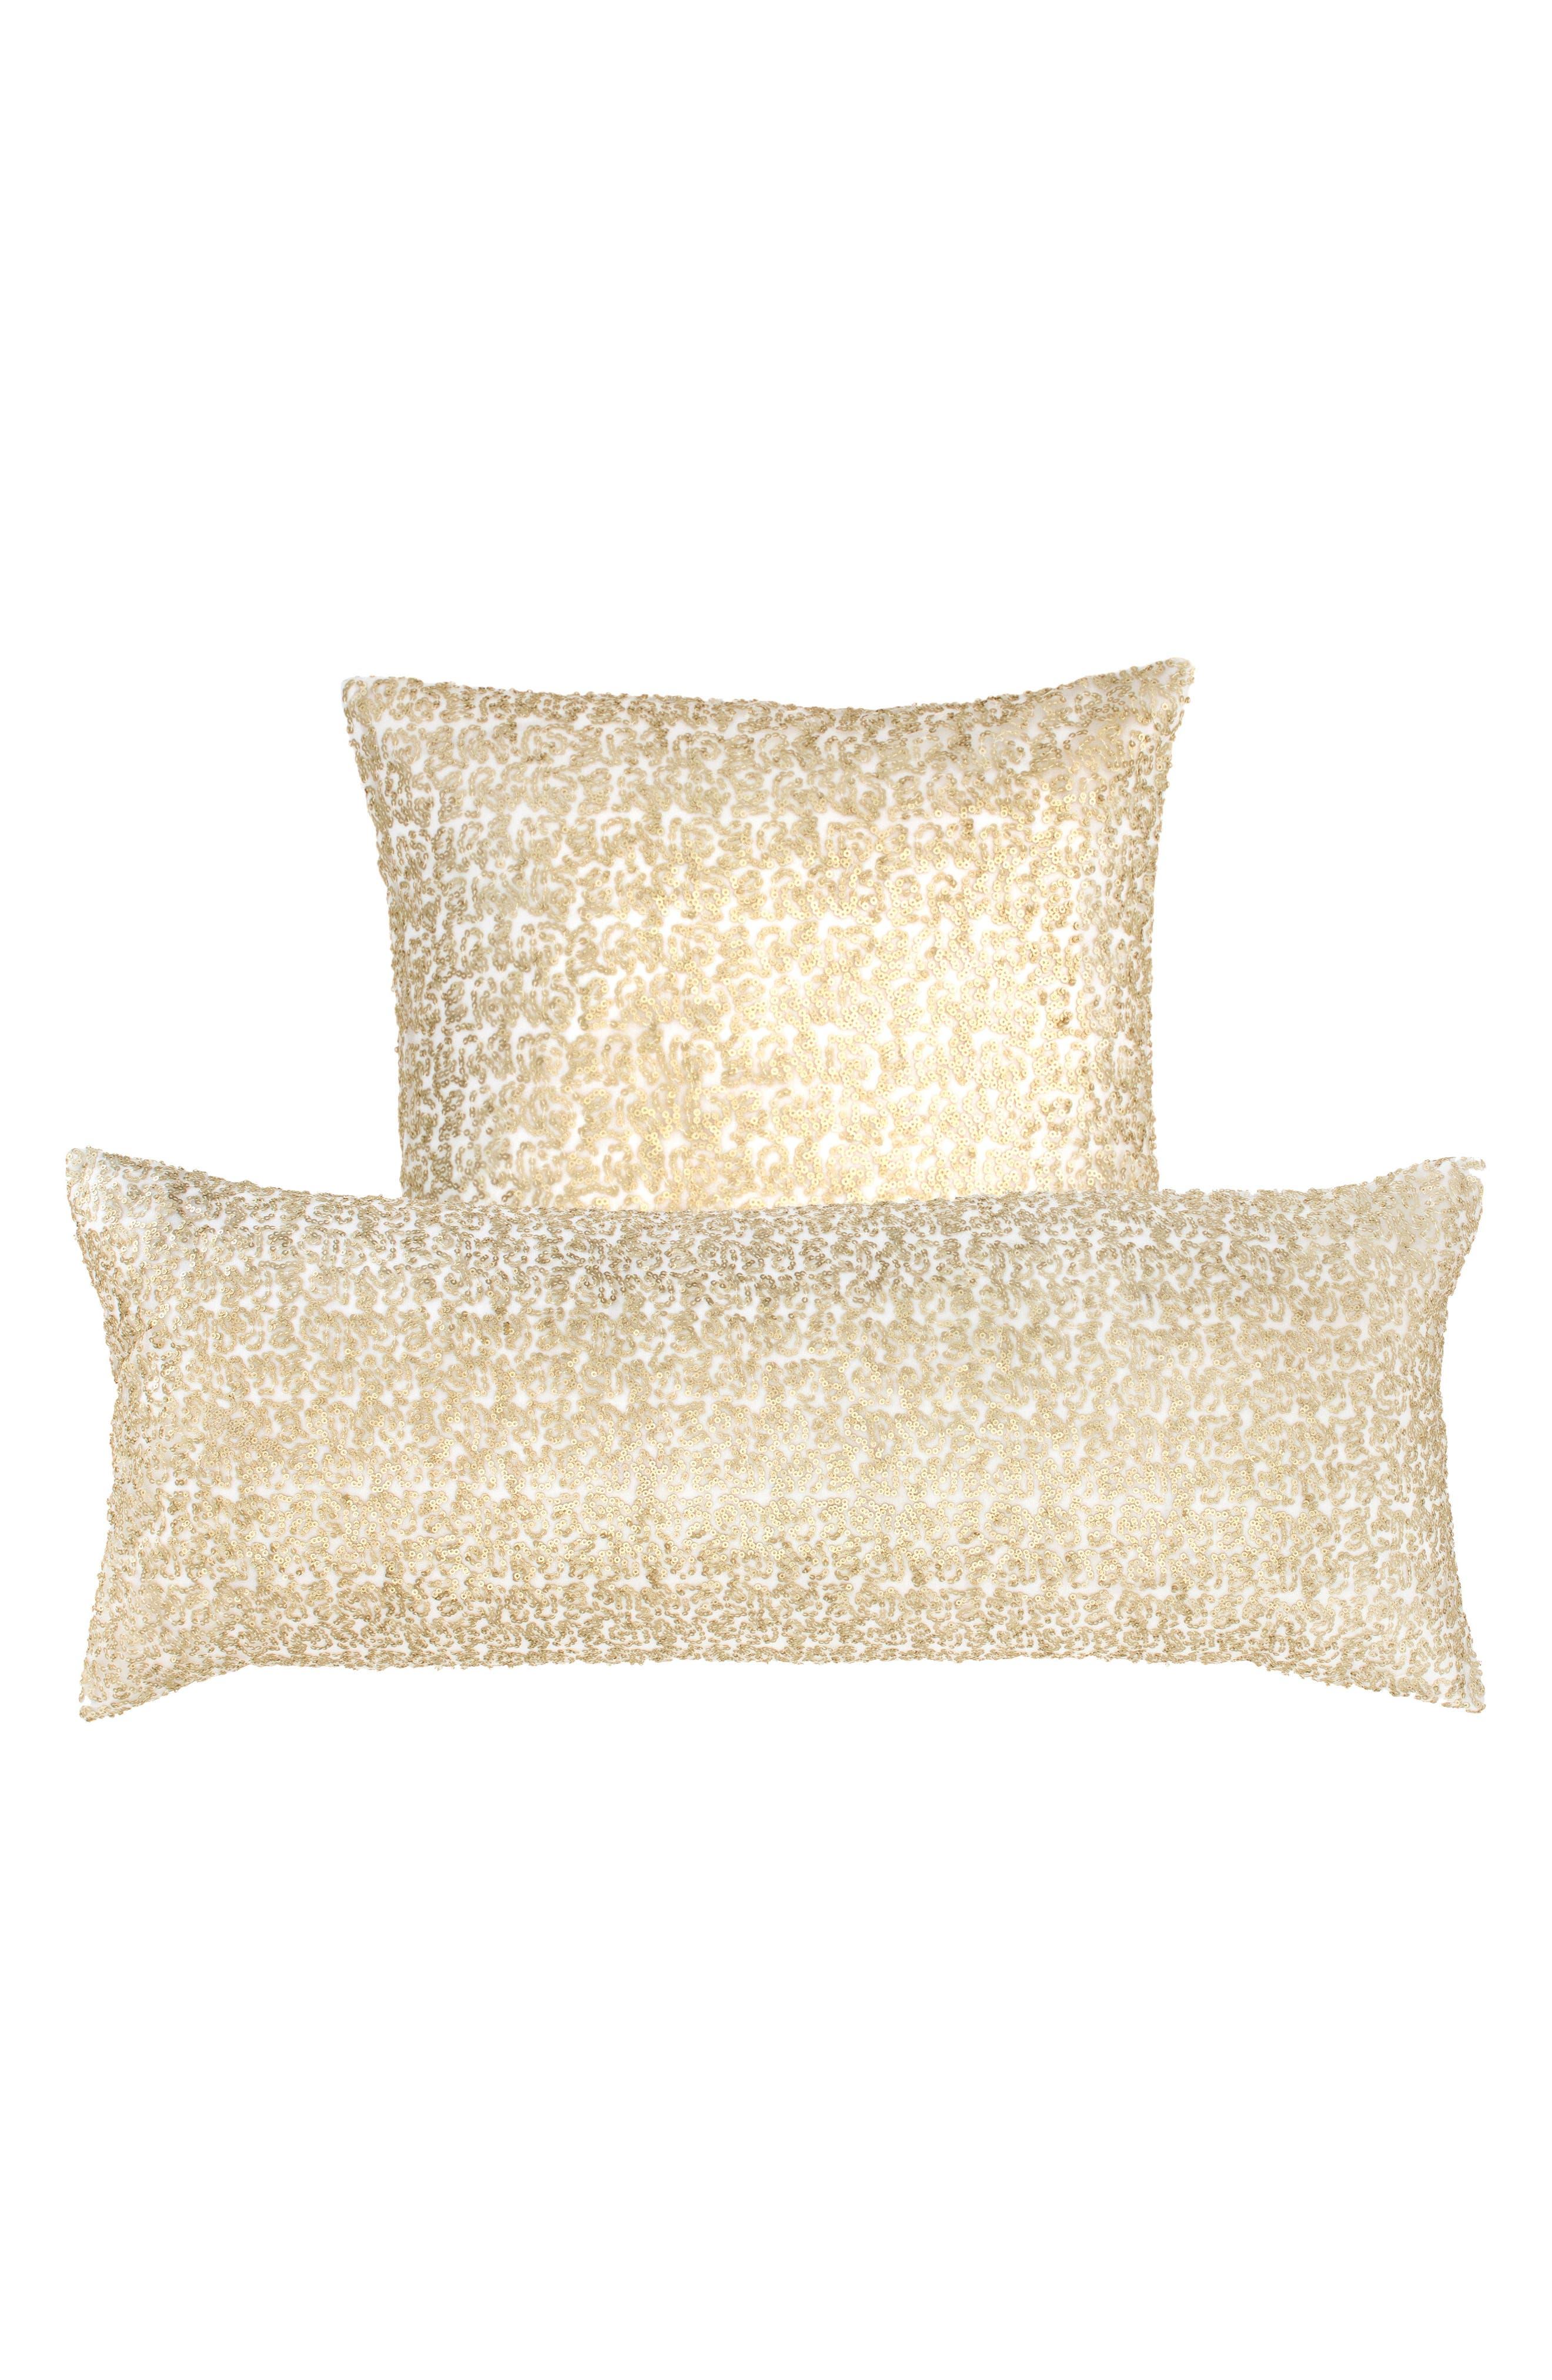 Glaze Sequin Boudoir Pillow,                             Alternate thumbnail 2, color,                             Ivory